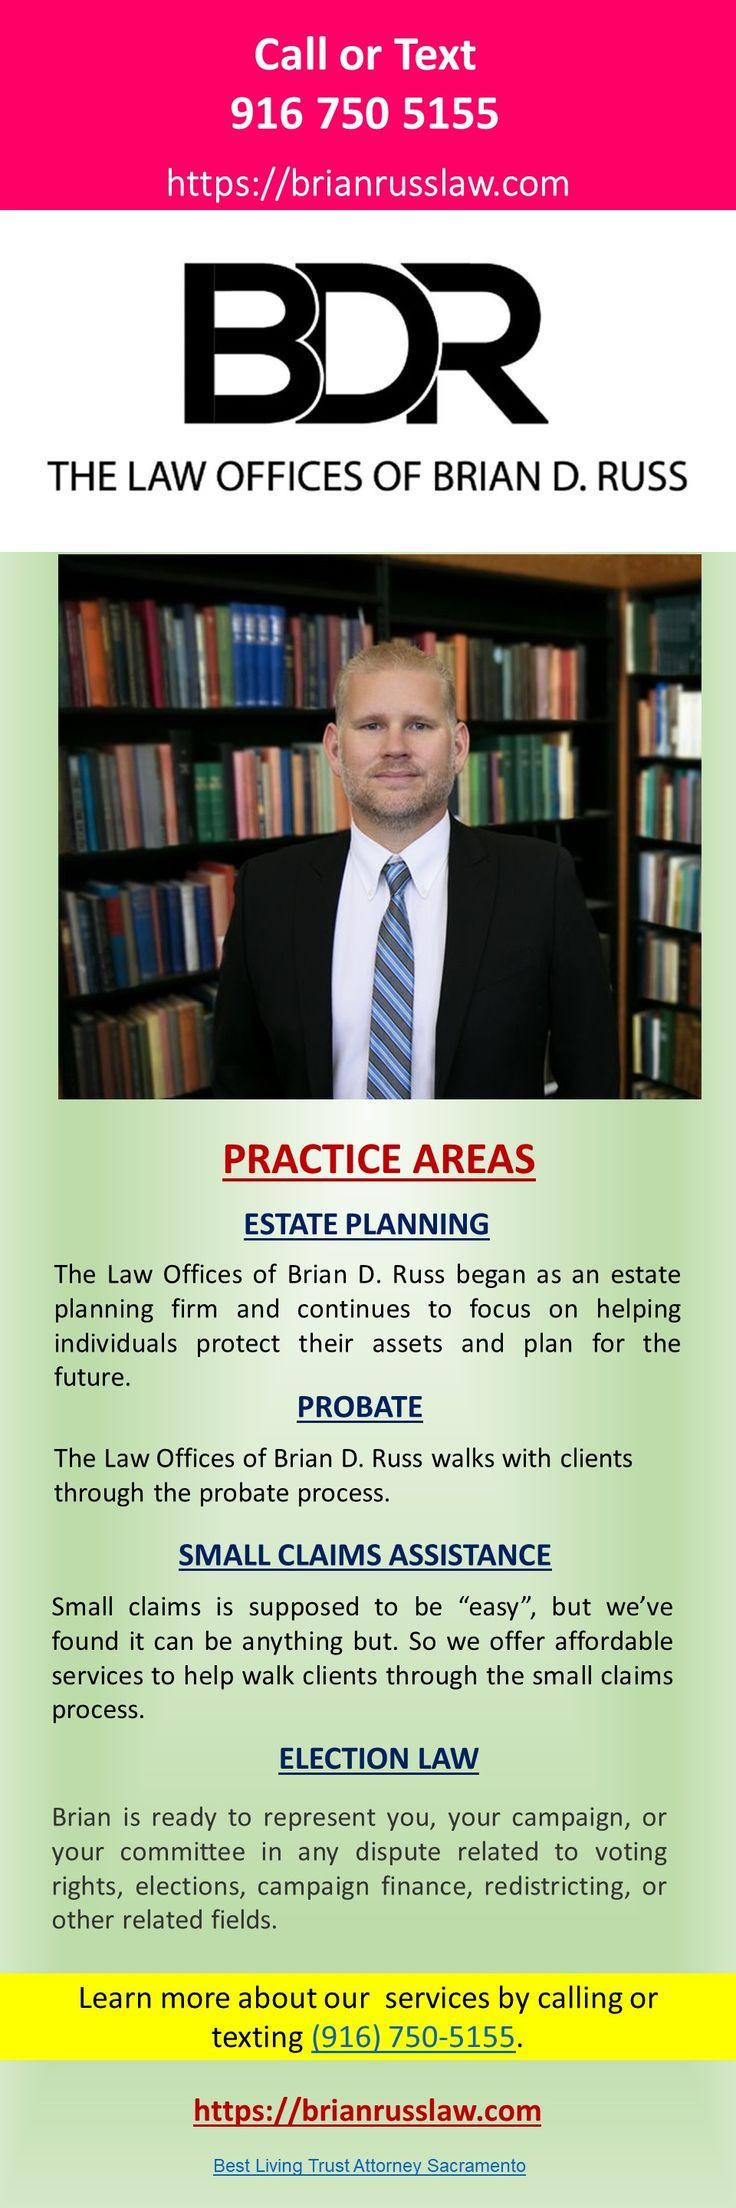 Best Living Trust Attorney Sacramento near me www